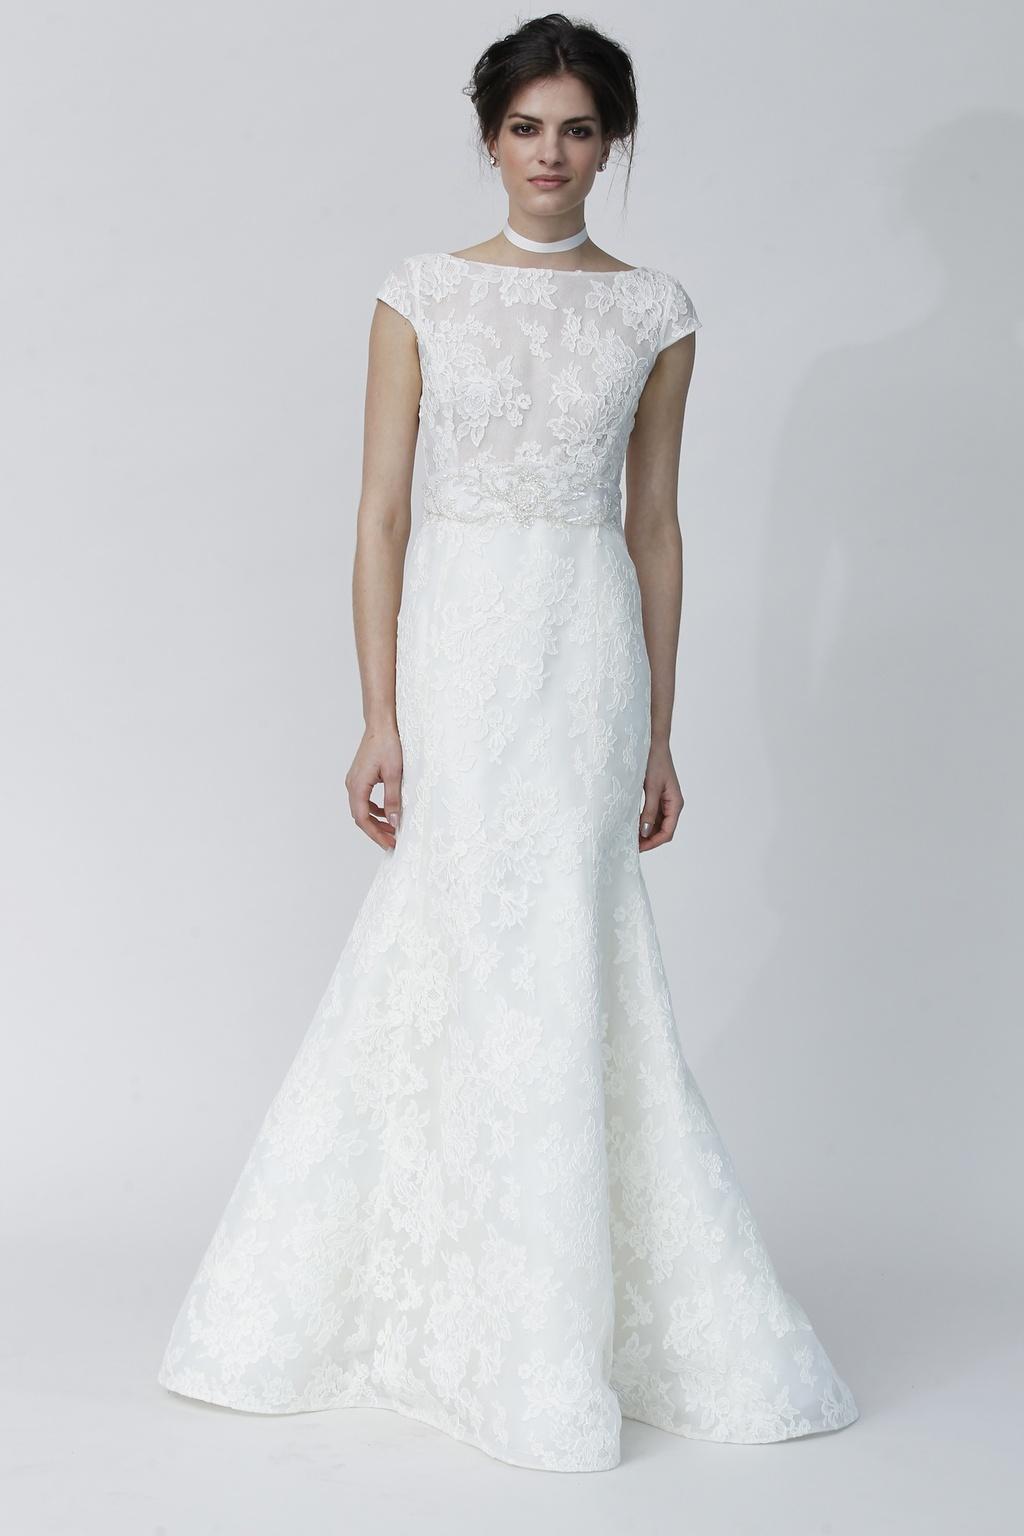 Margherita-wedding-dress-by-rivini-fall-2014-bridal.full